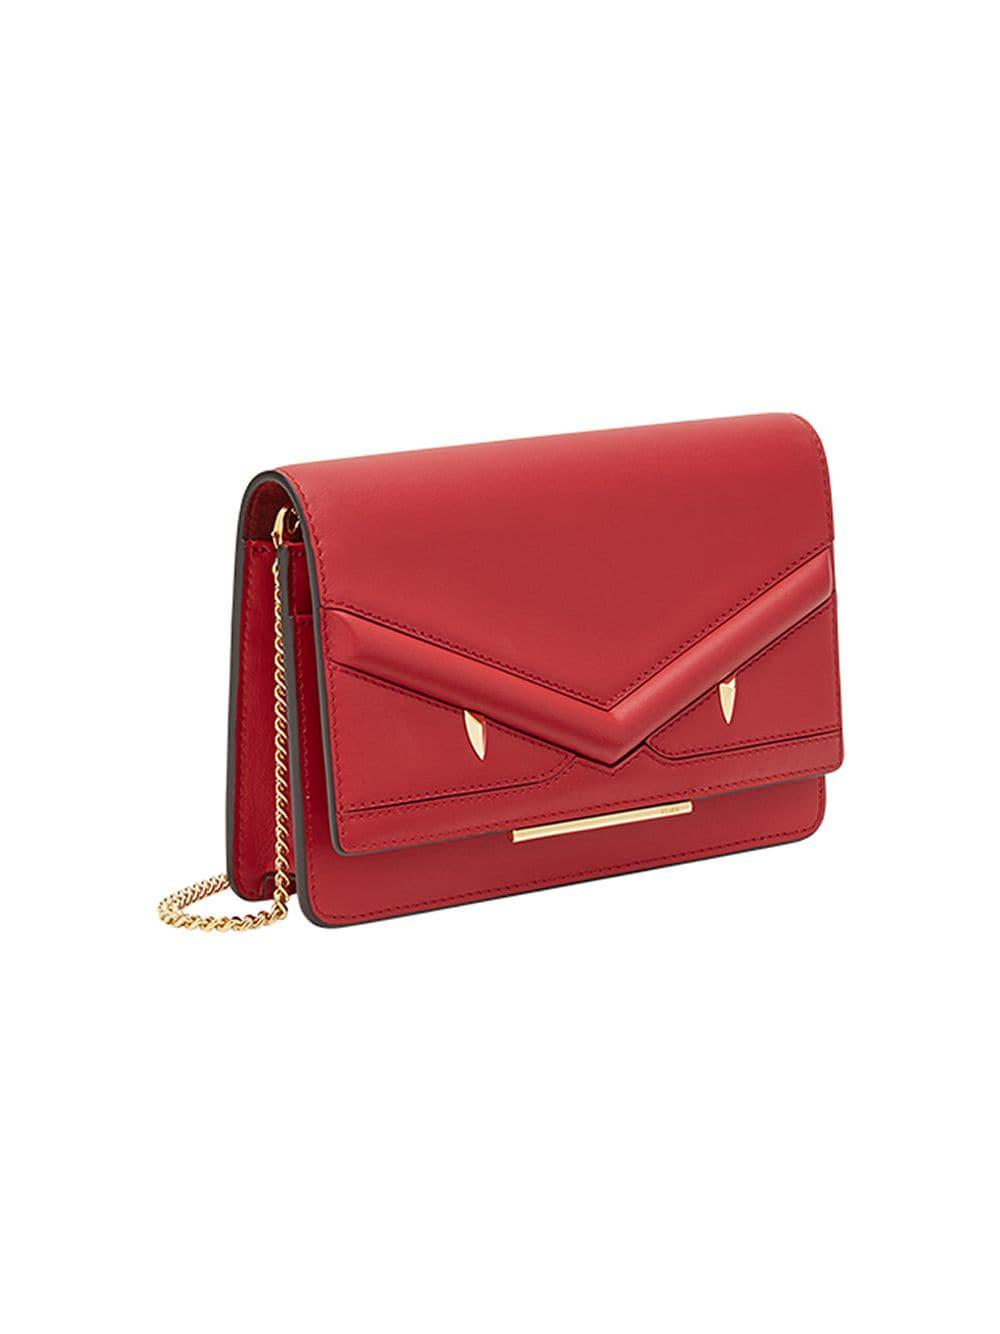 a289dc0f41c7 Lyst - Fendi Wallet On Chain Mini Bag in Red